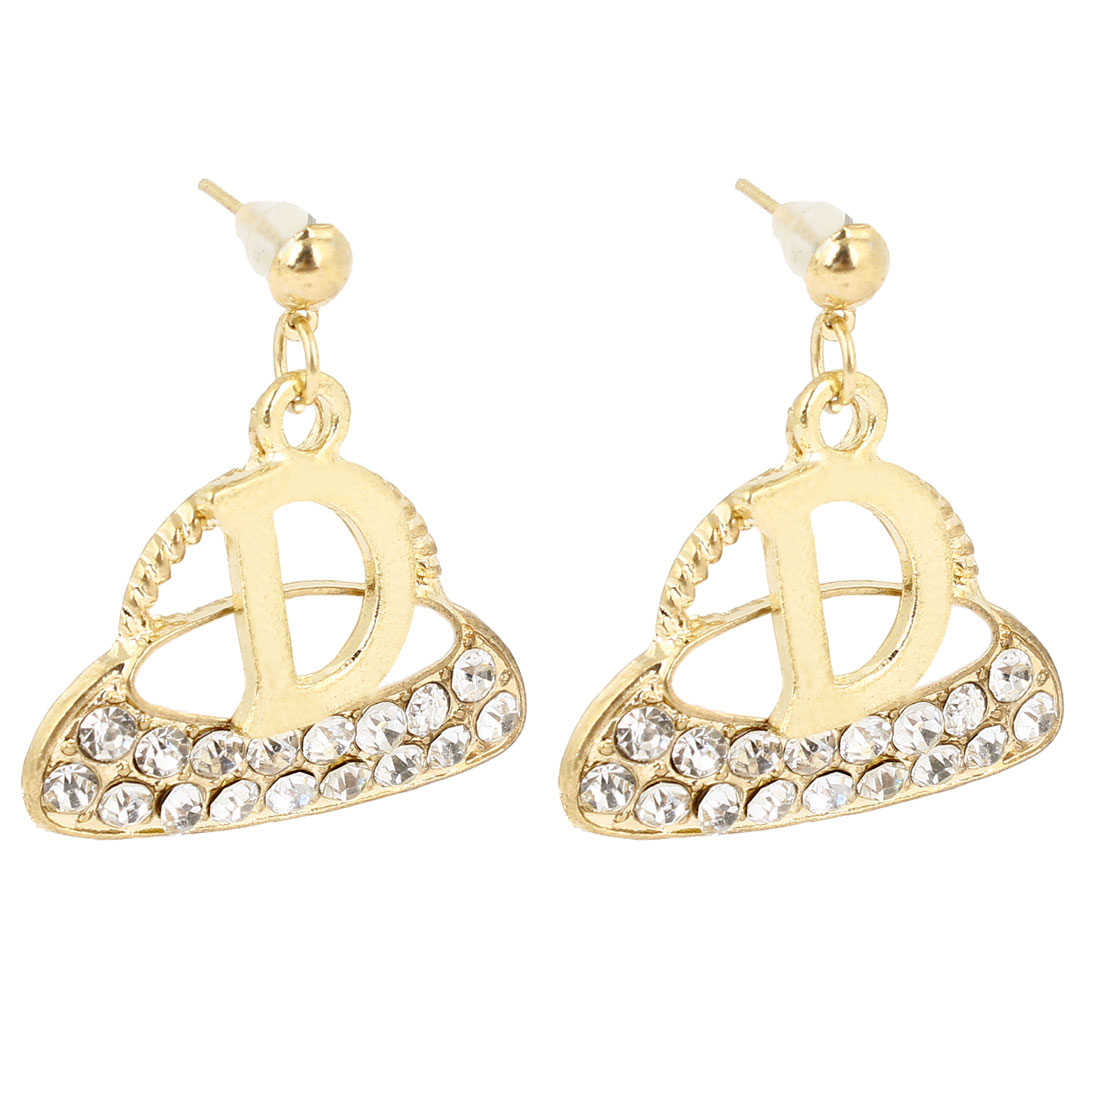 Girls Ear Ornament Gold Tone Bag Design Rhinestones Inlaid Stud Earrings Pair